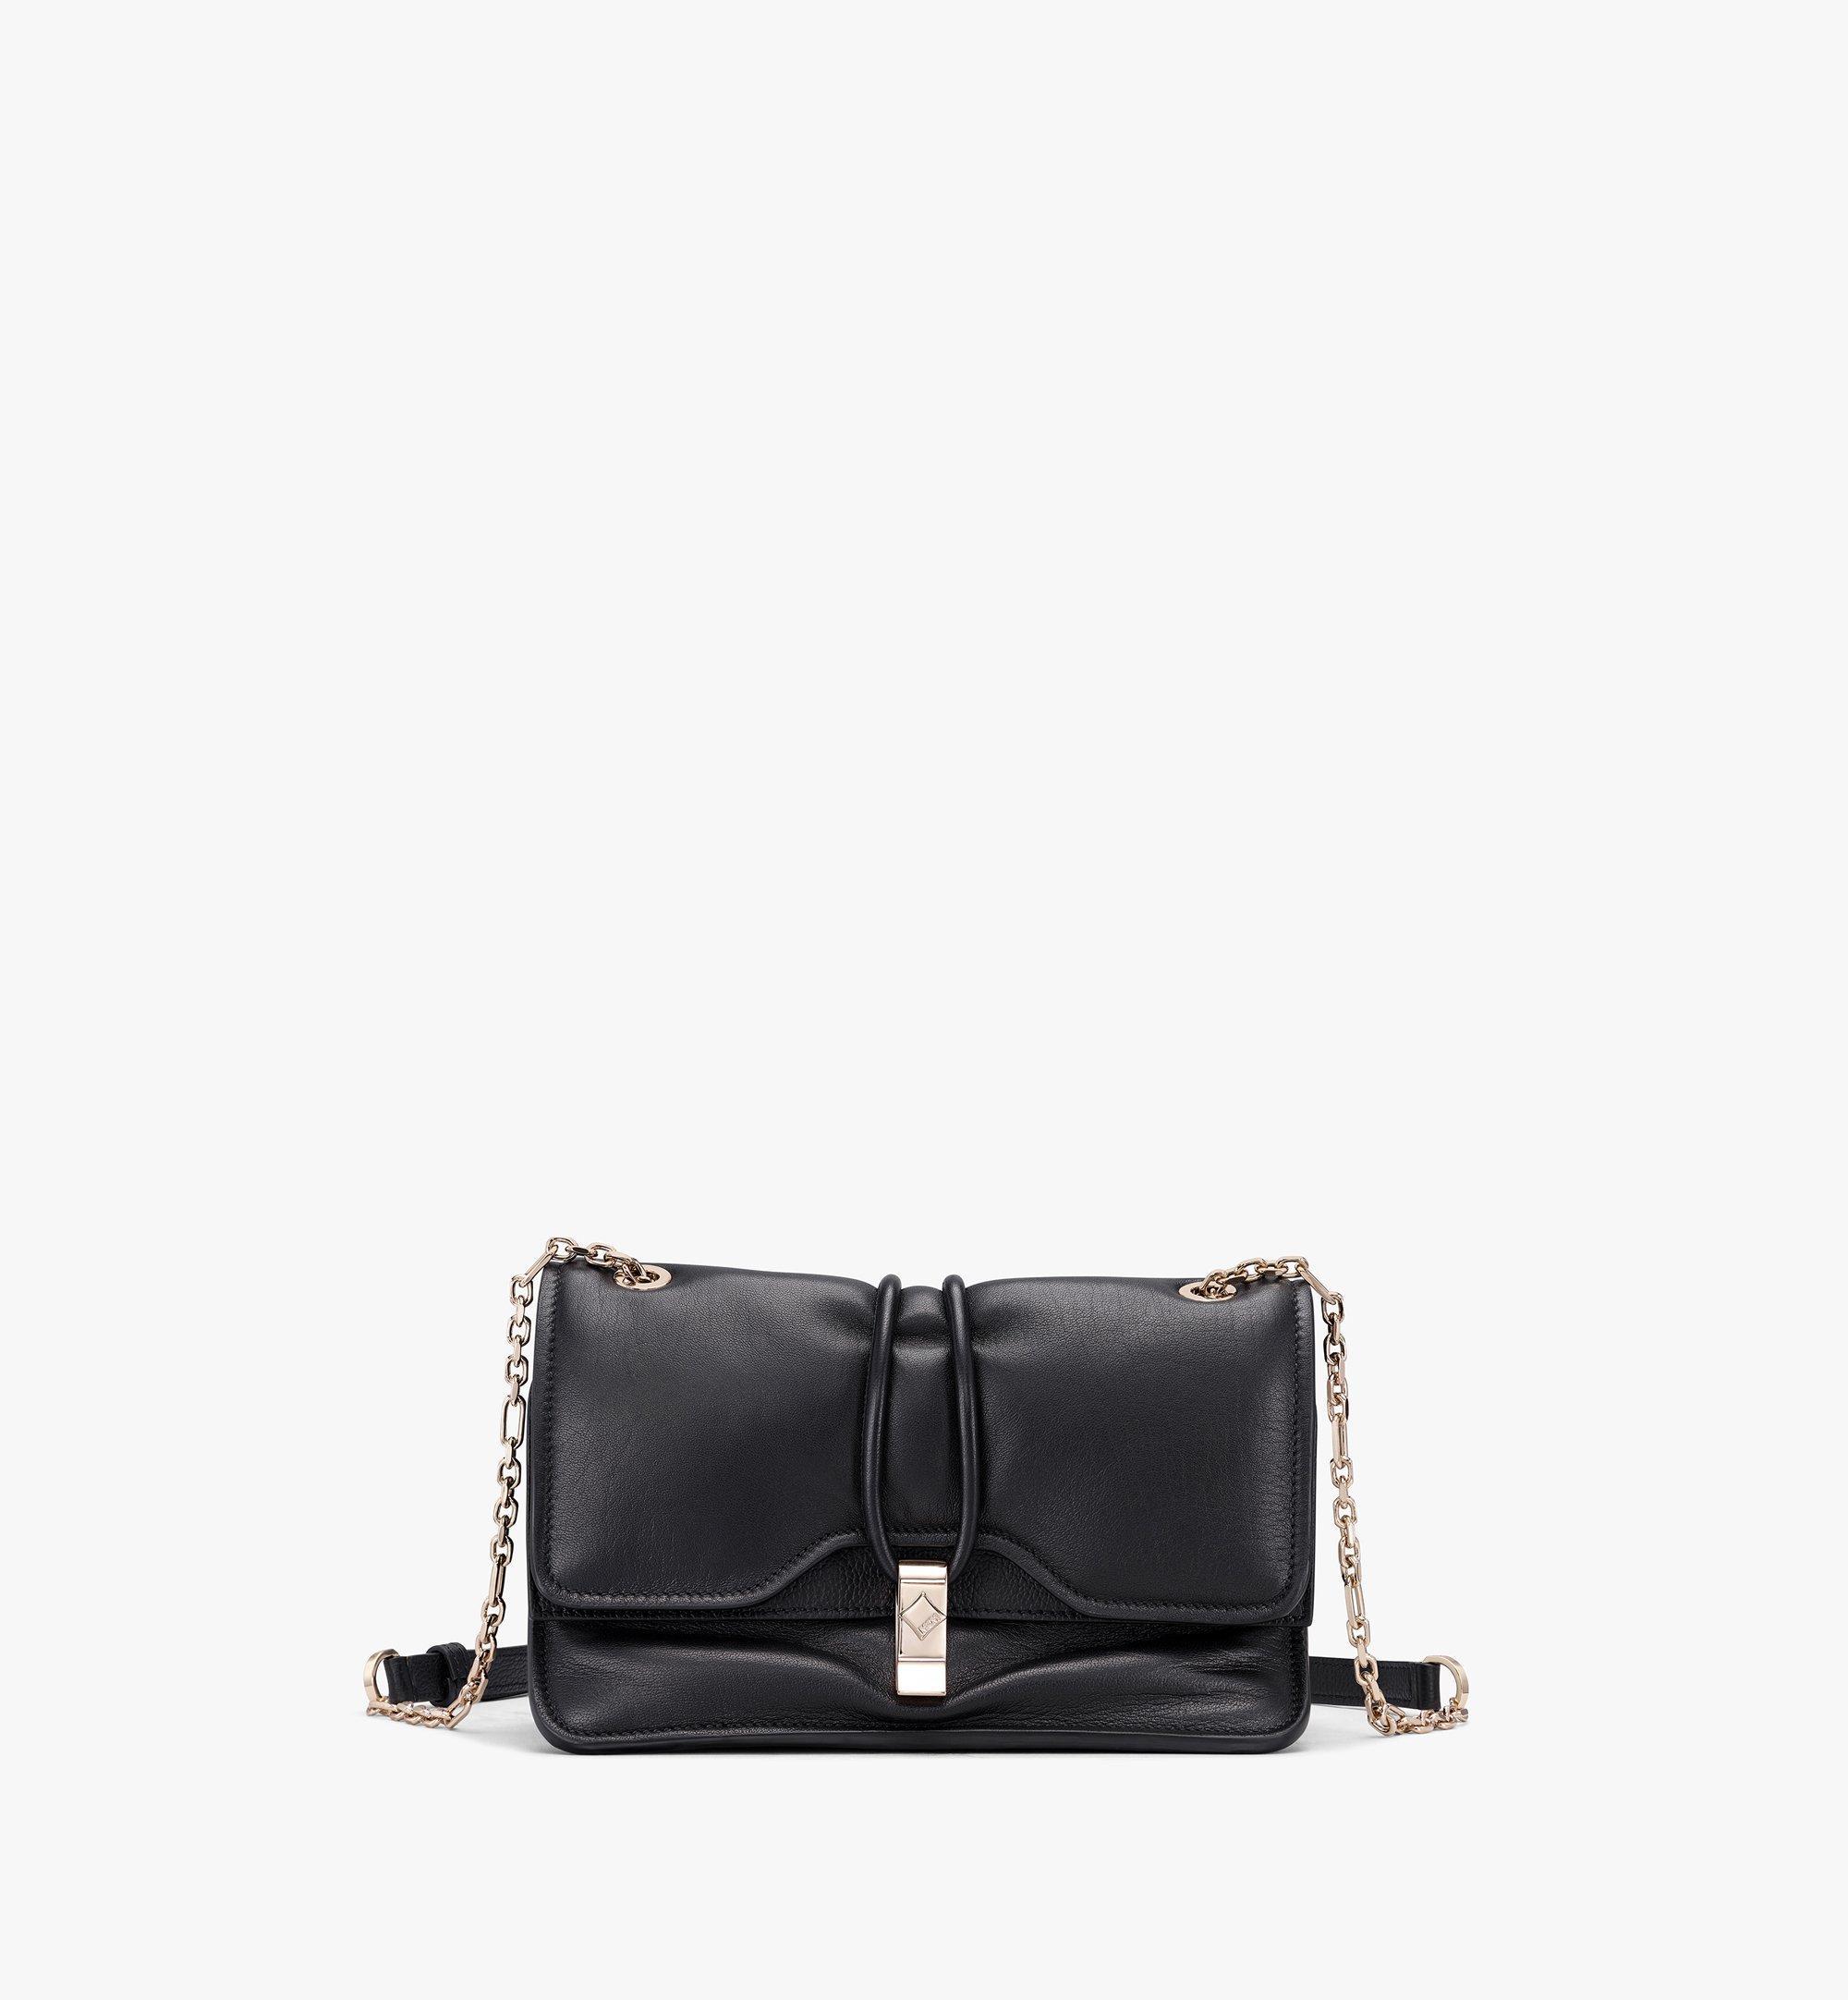 MCM Candy Shoulder Bag in Nappa Leather Black MWSASCY05BK001 Alternate View 1